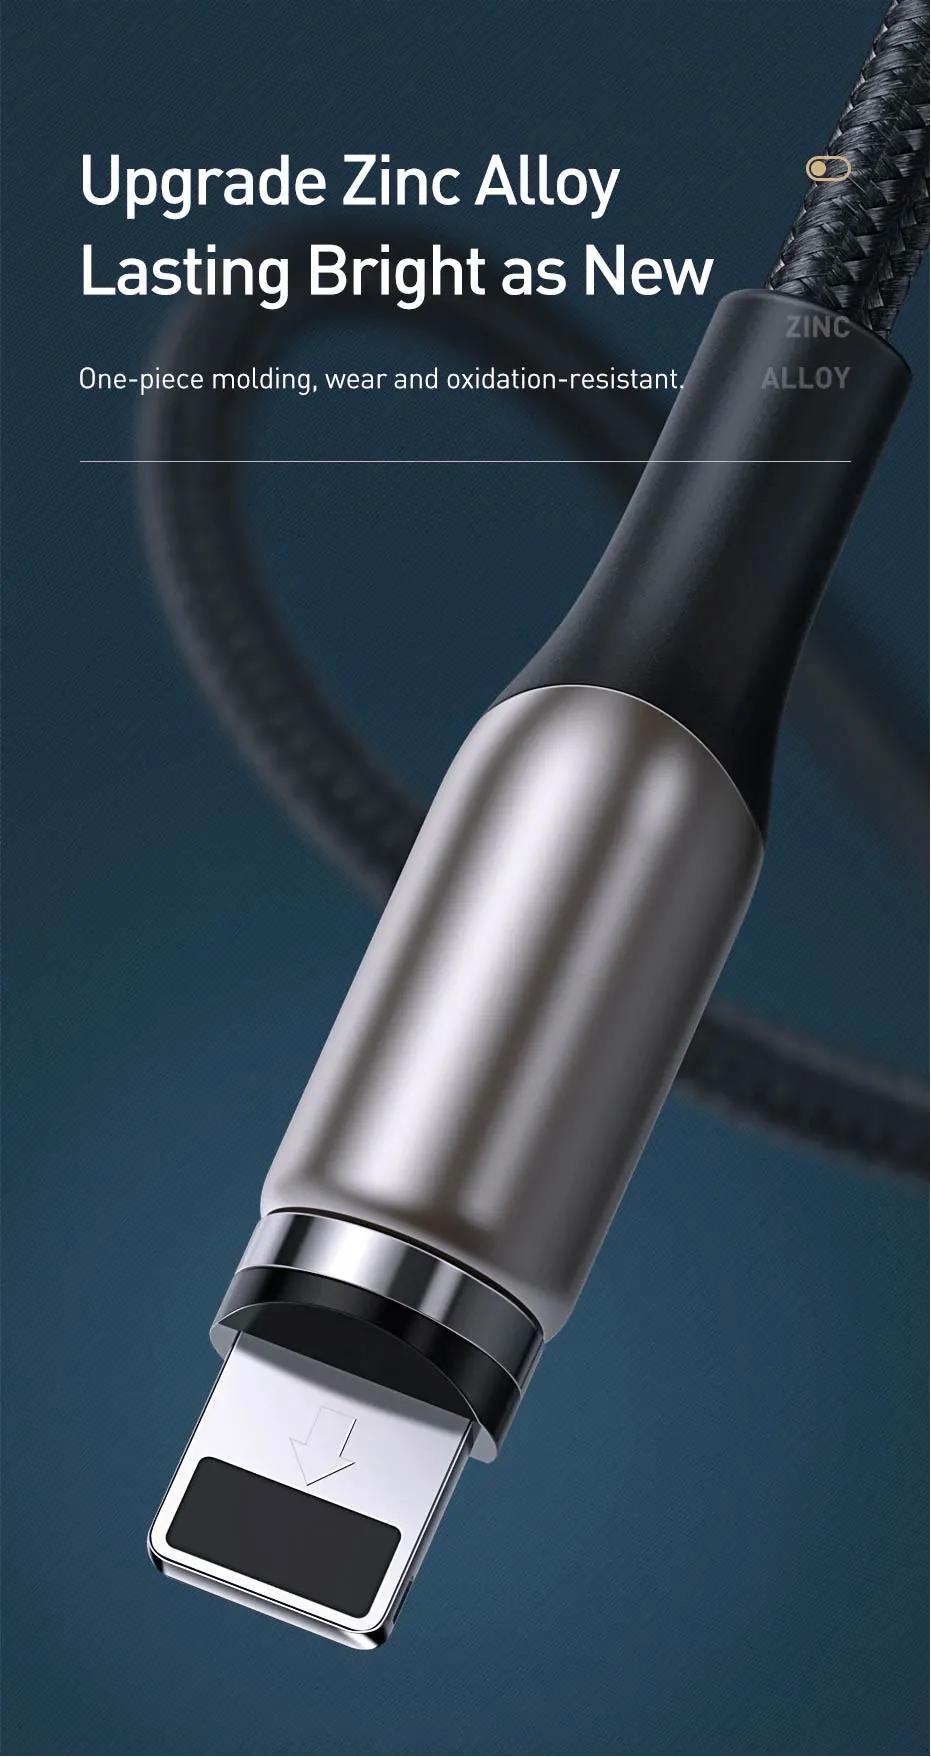 Cabo Usb Para Iphone Magnético Baseus Legitimo Zinc 2A 1 Metro preto (Ref. CALXC-H01)